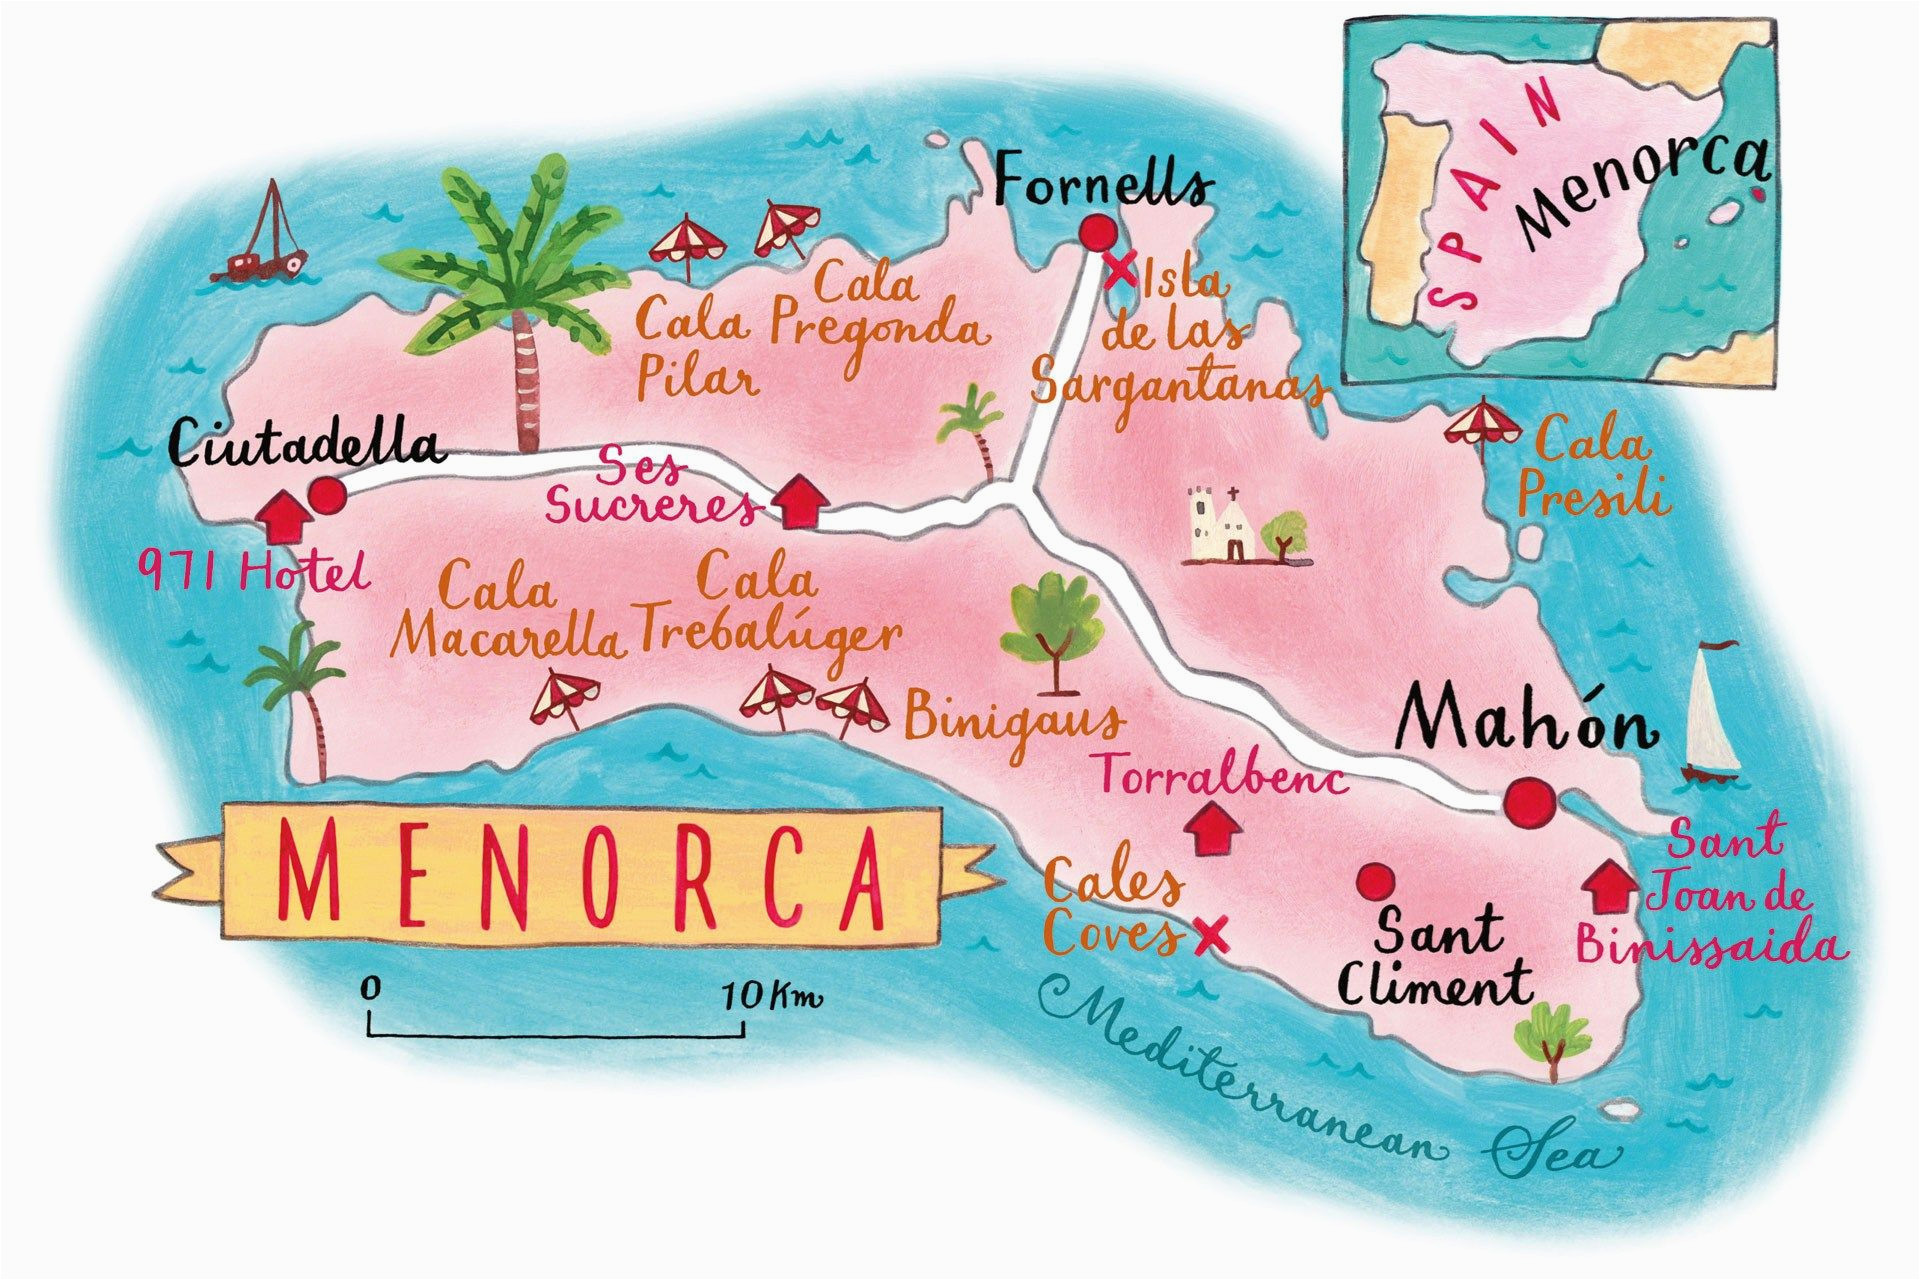 menorca the beat free balearic island places to go menorca